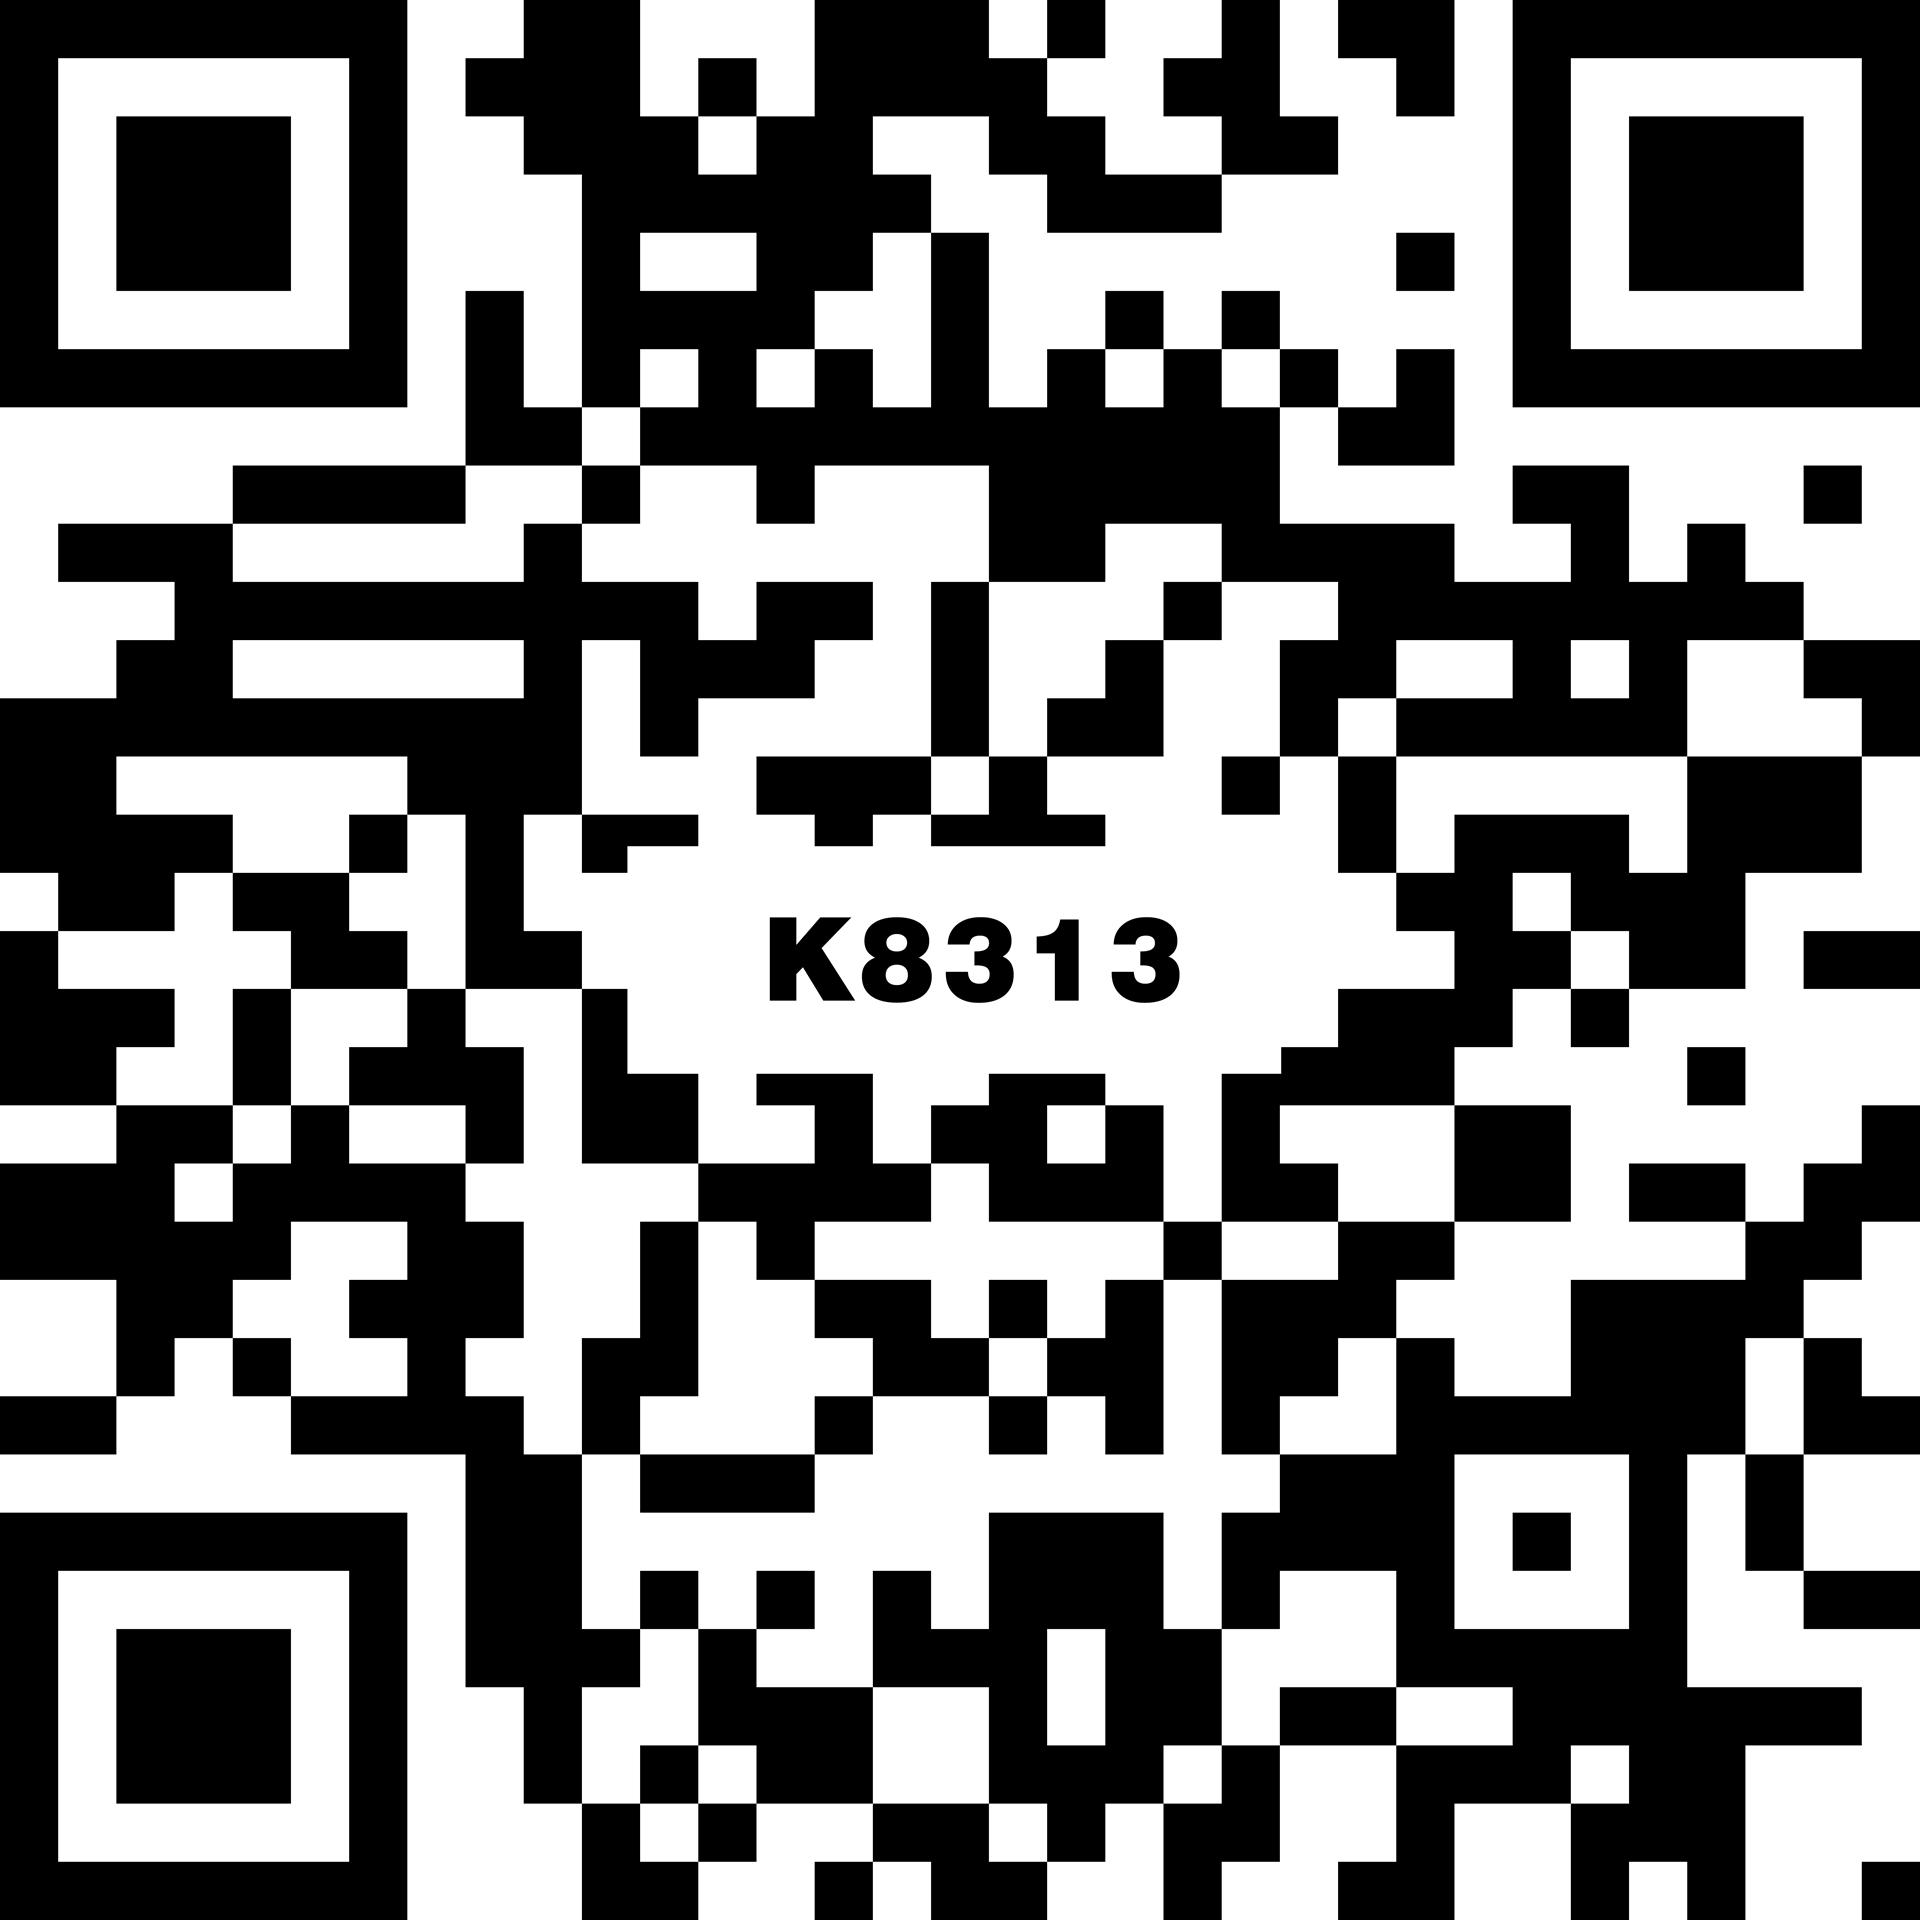 K8313